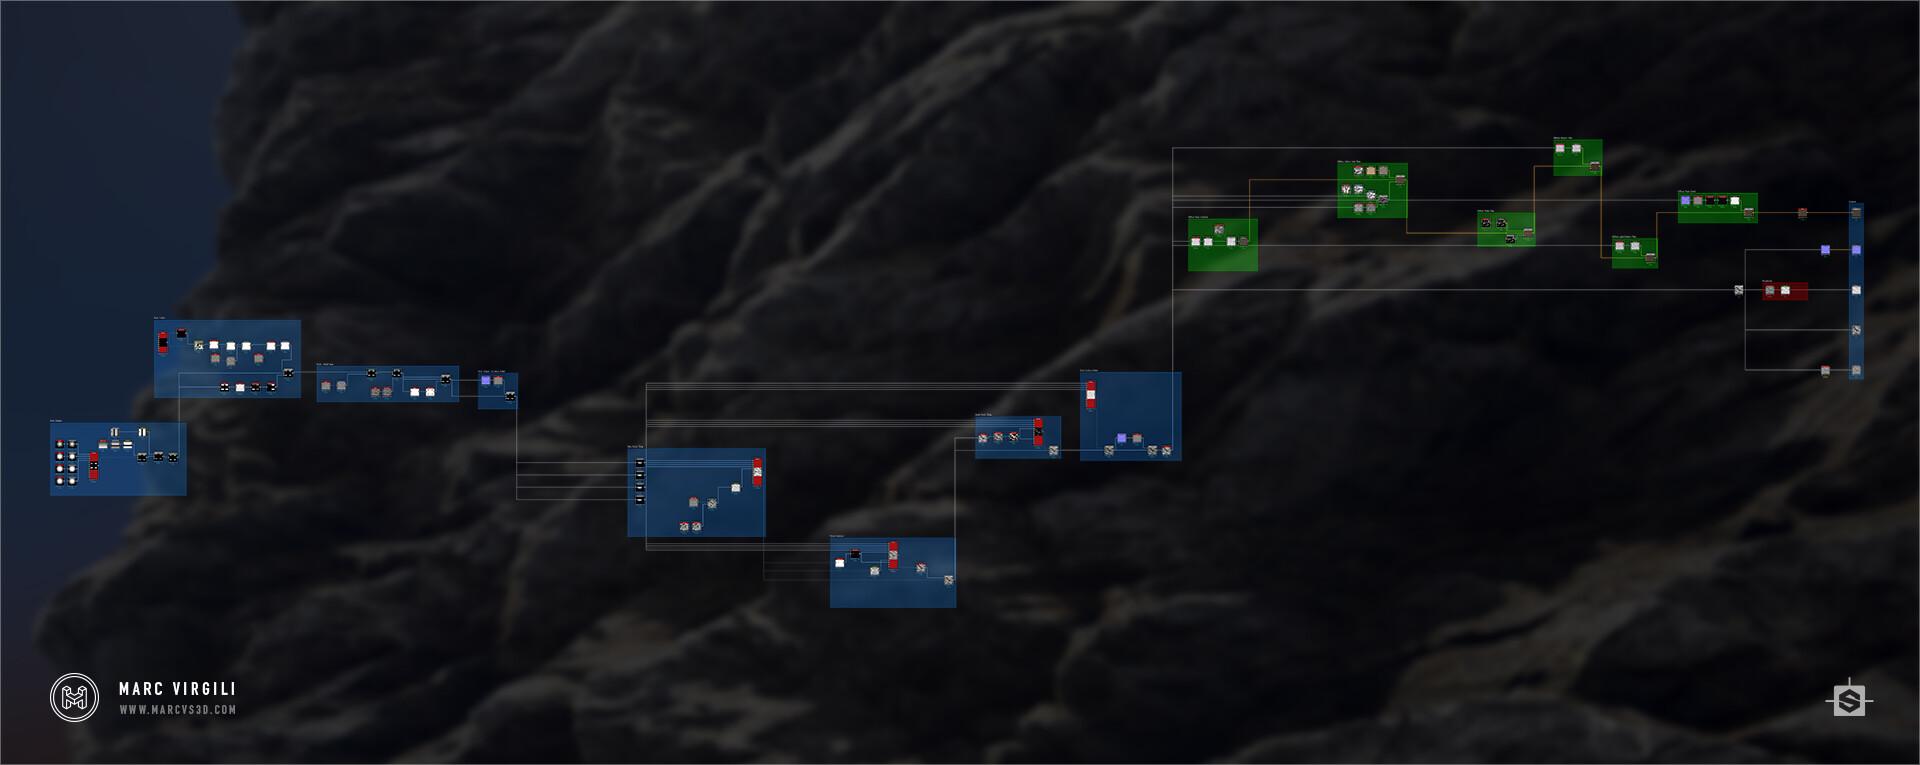 Marc virgili jaggedrock graph